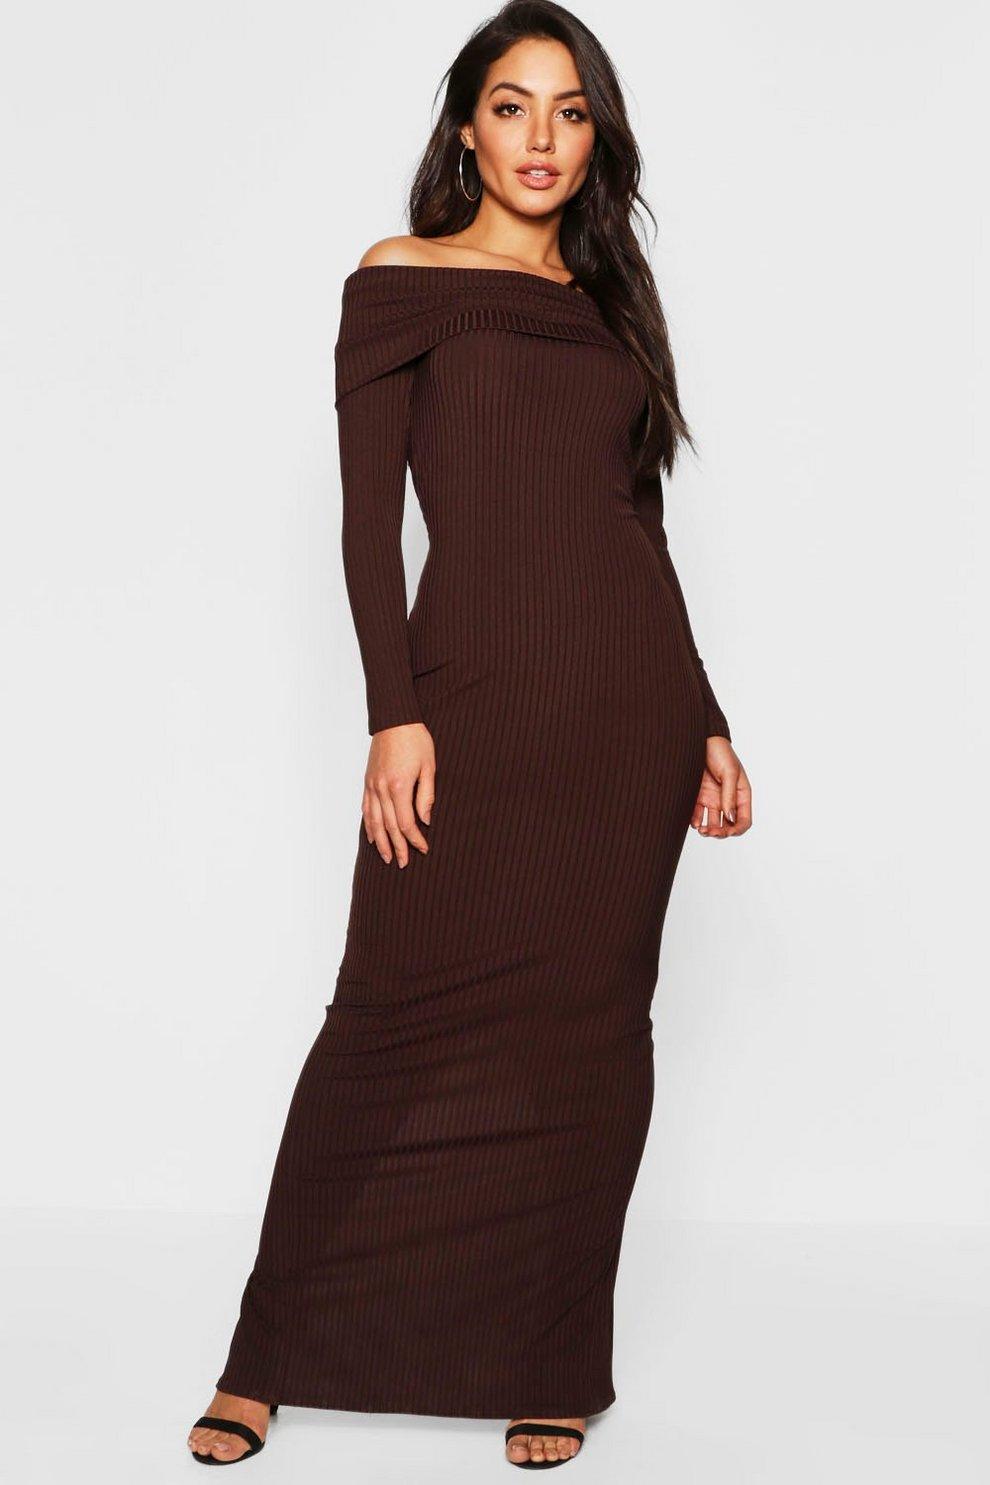 7ef53a6b9514 Jumbo Rib Bardot Maxi Dress